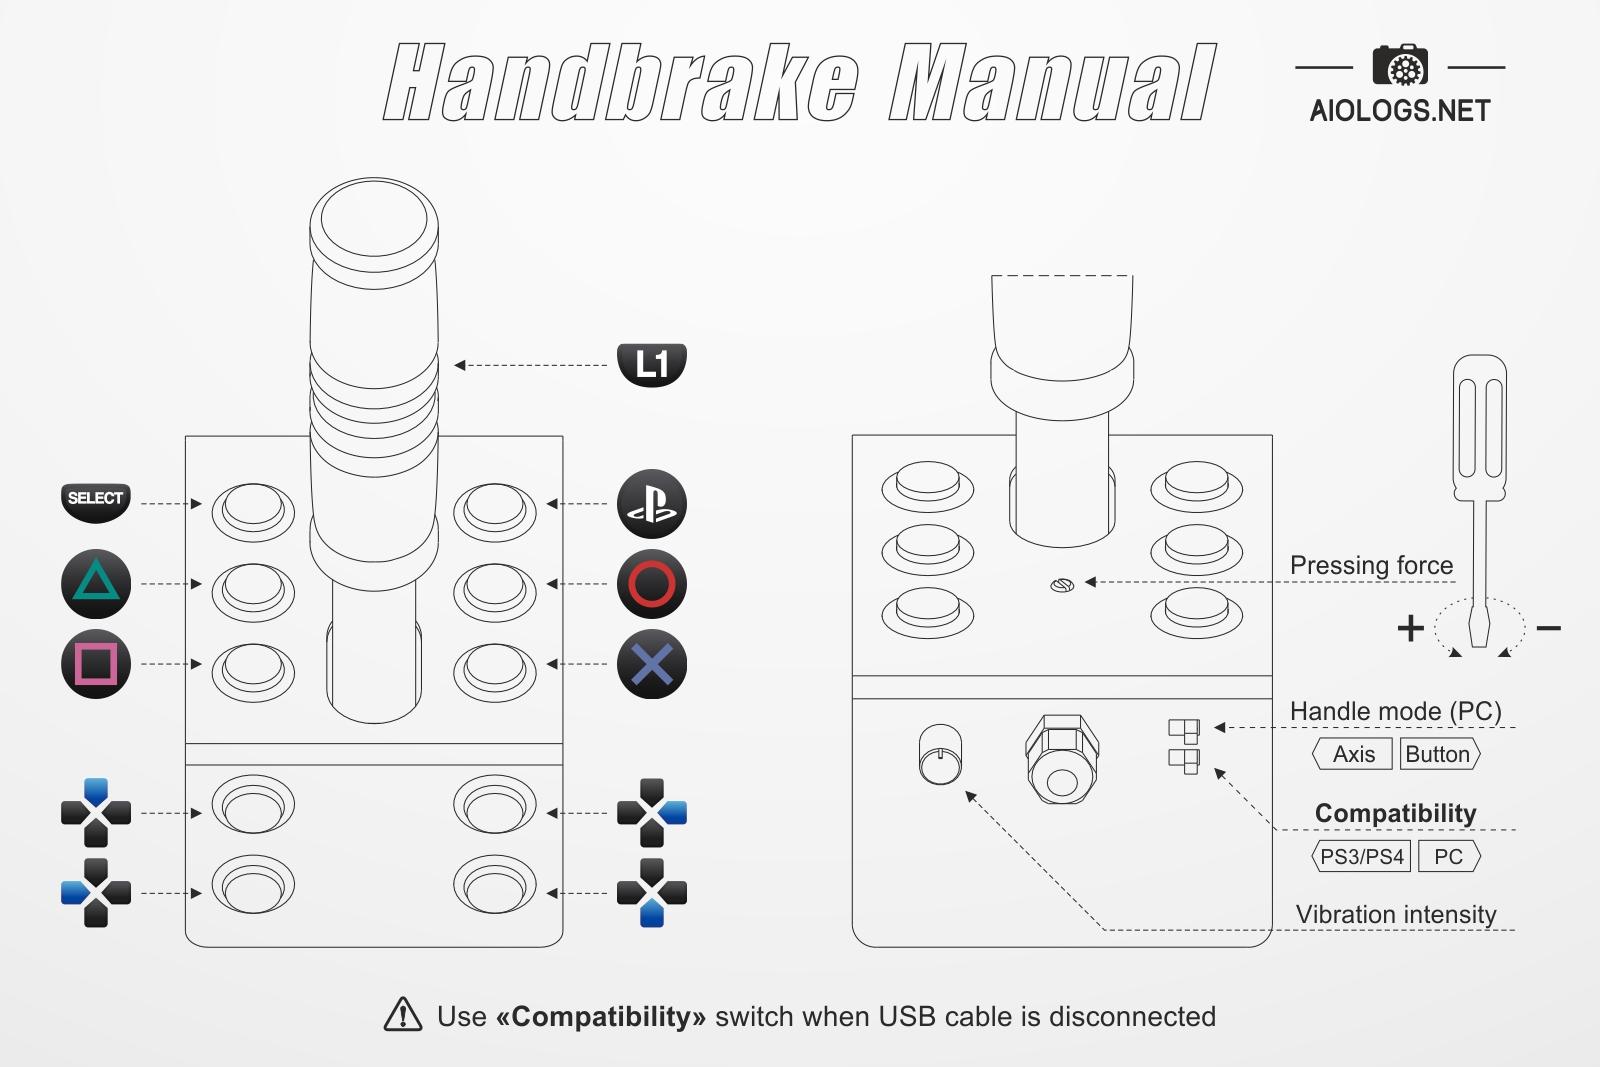 handbrake-manual.jpg